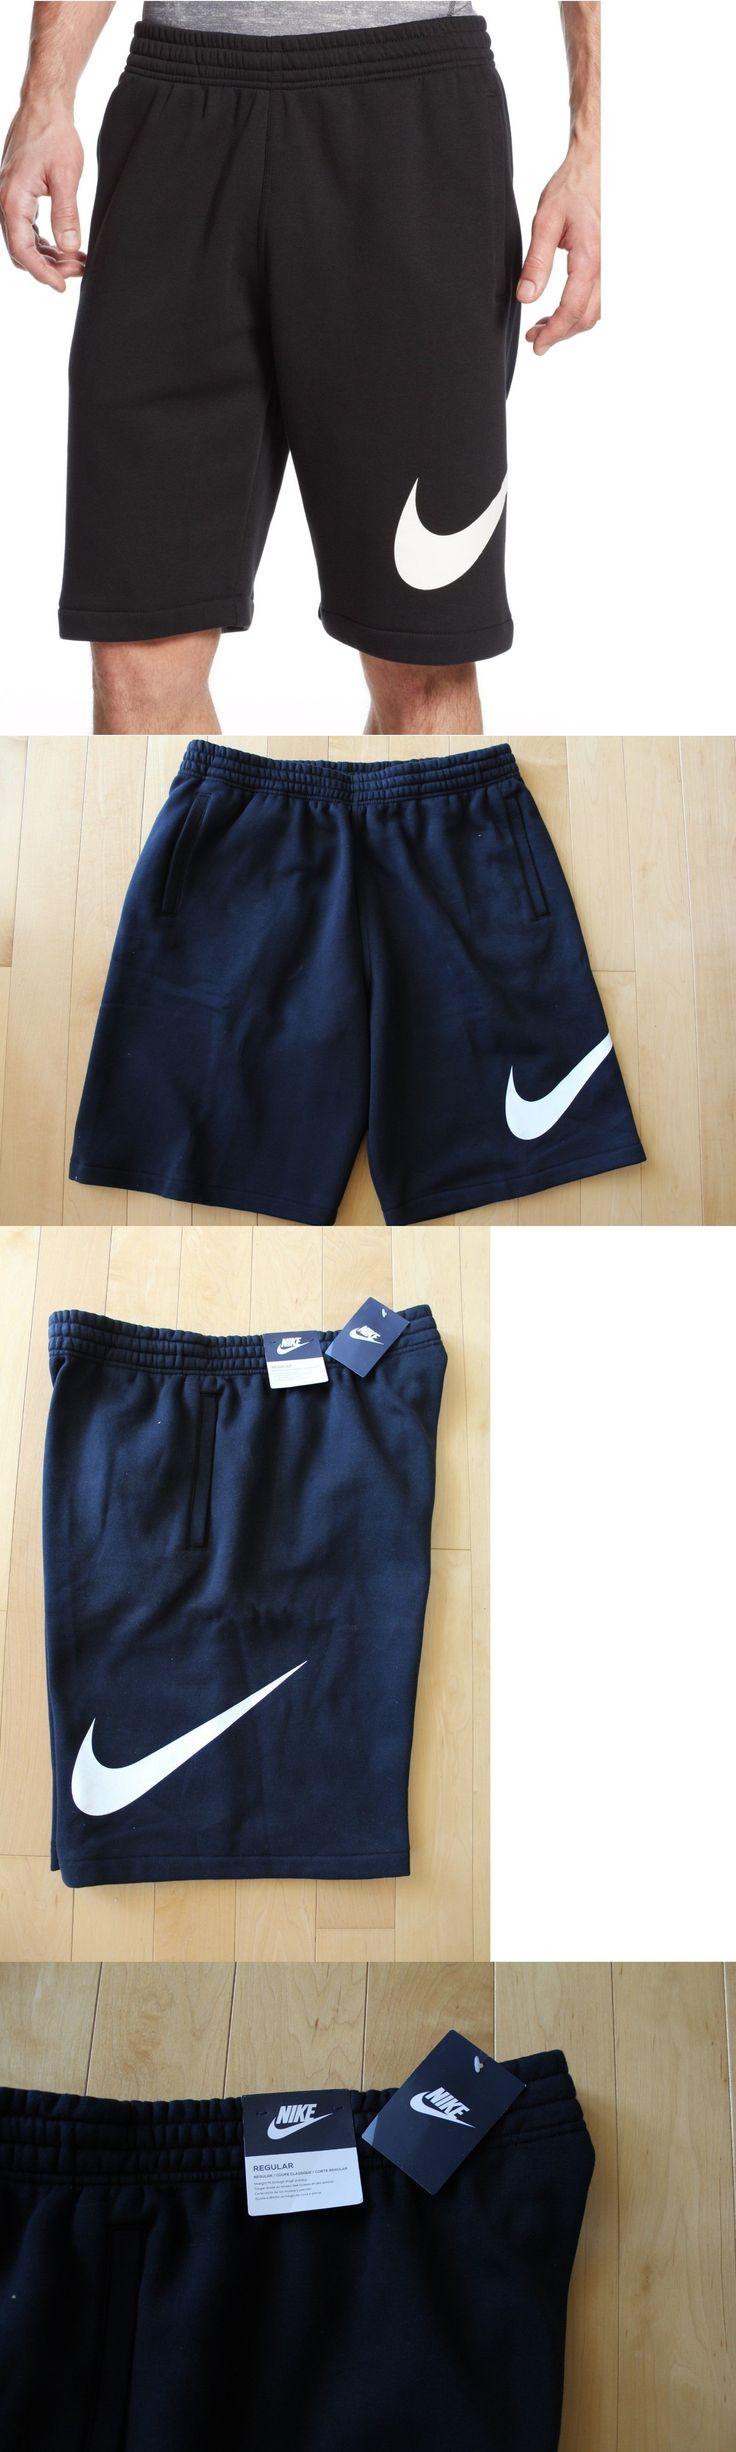 Athletic Apparel 137084: Nwt Nike Men S Logo Swoosh Fleece Shorts Black White M L Xl -> BUY IT NOW ONLY: $37.05 on eBay!